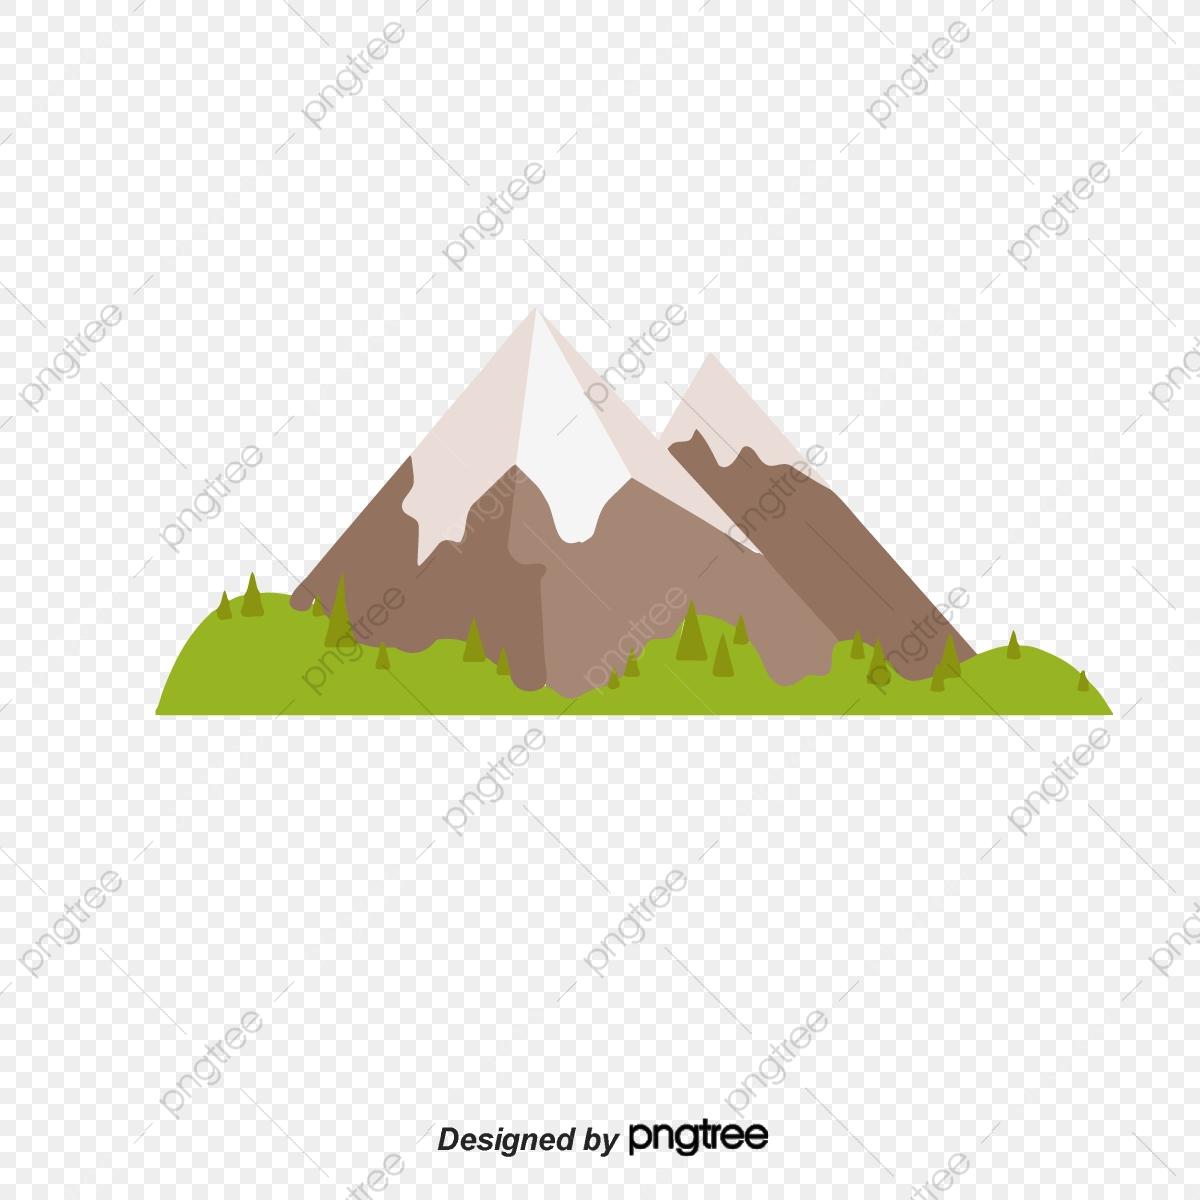 Cartoon Snow Mountain, Cartoon Clipart, Snow Mountain, Snow PNG.